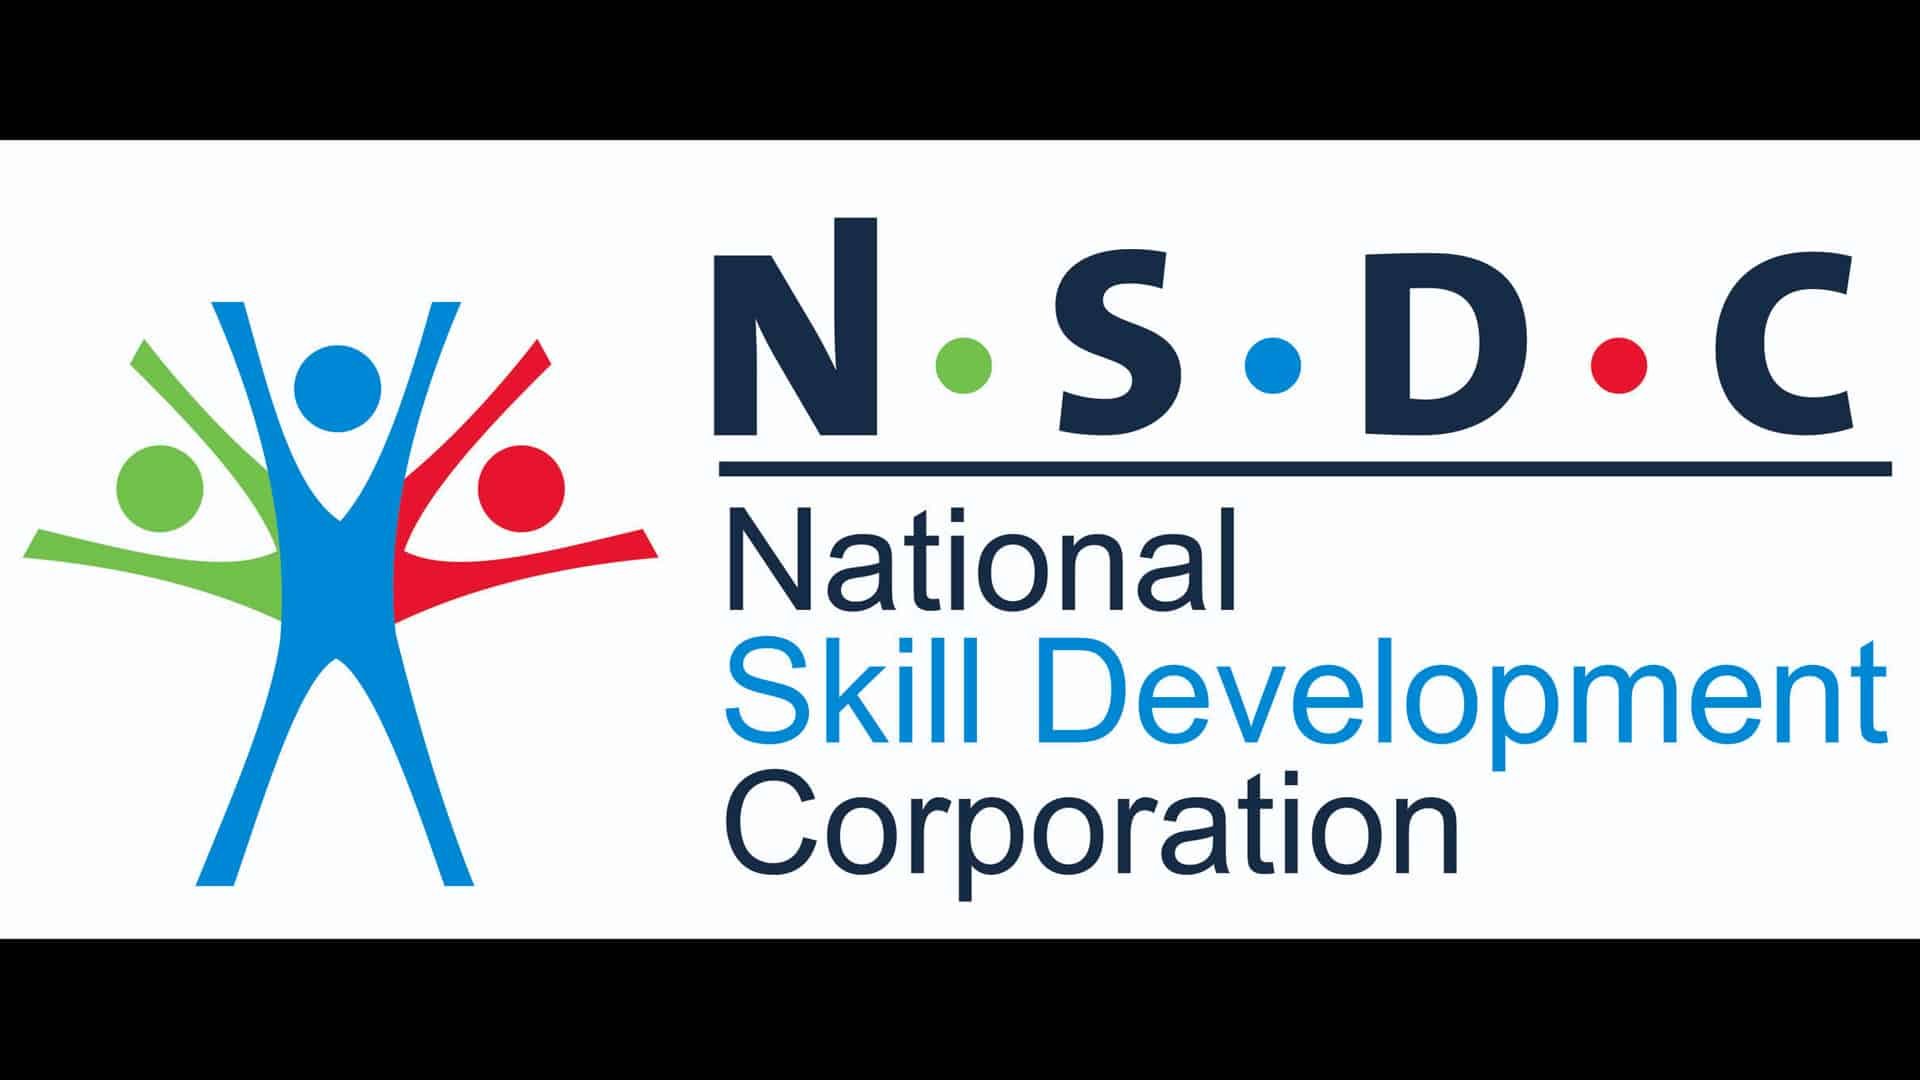 WhatsApp, NSDC launch initiative for skill development, entrepreneurship opportunities for youth